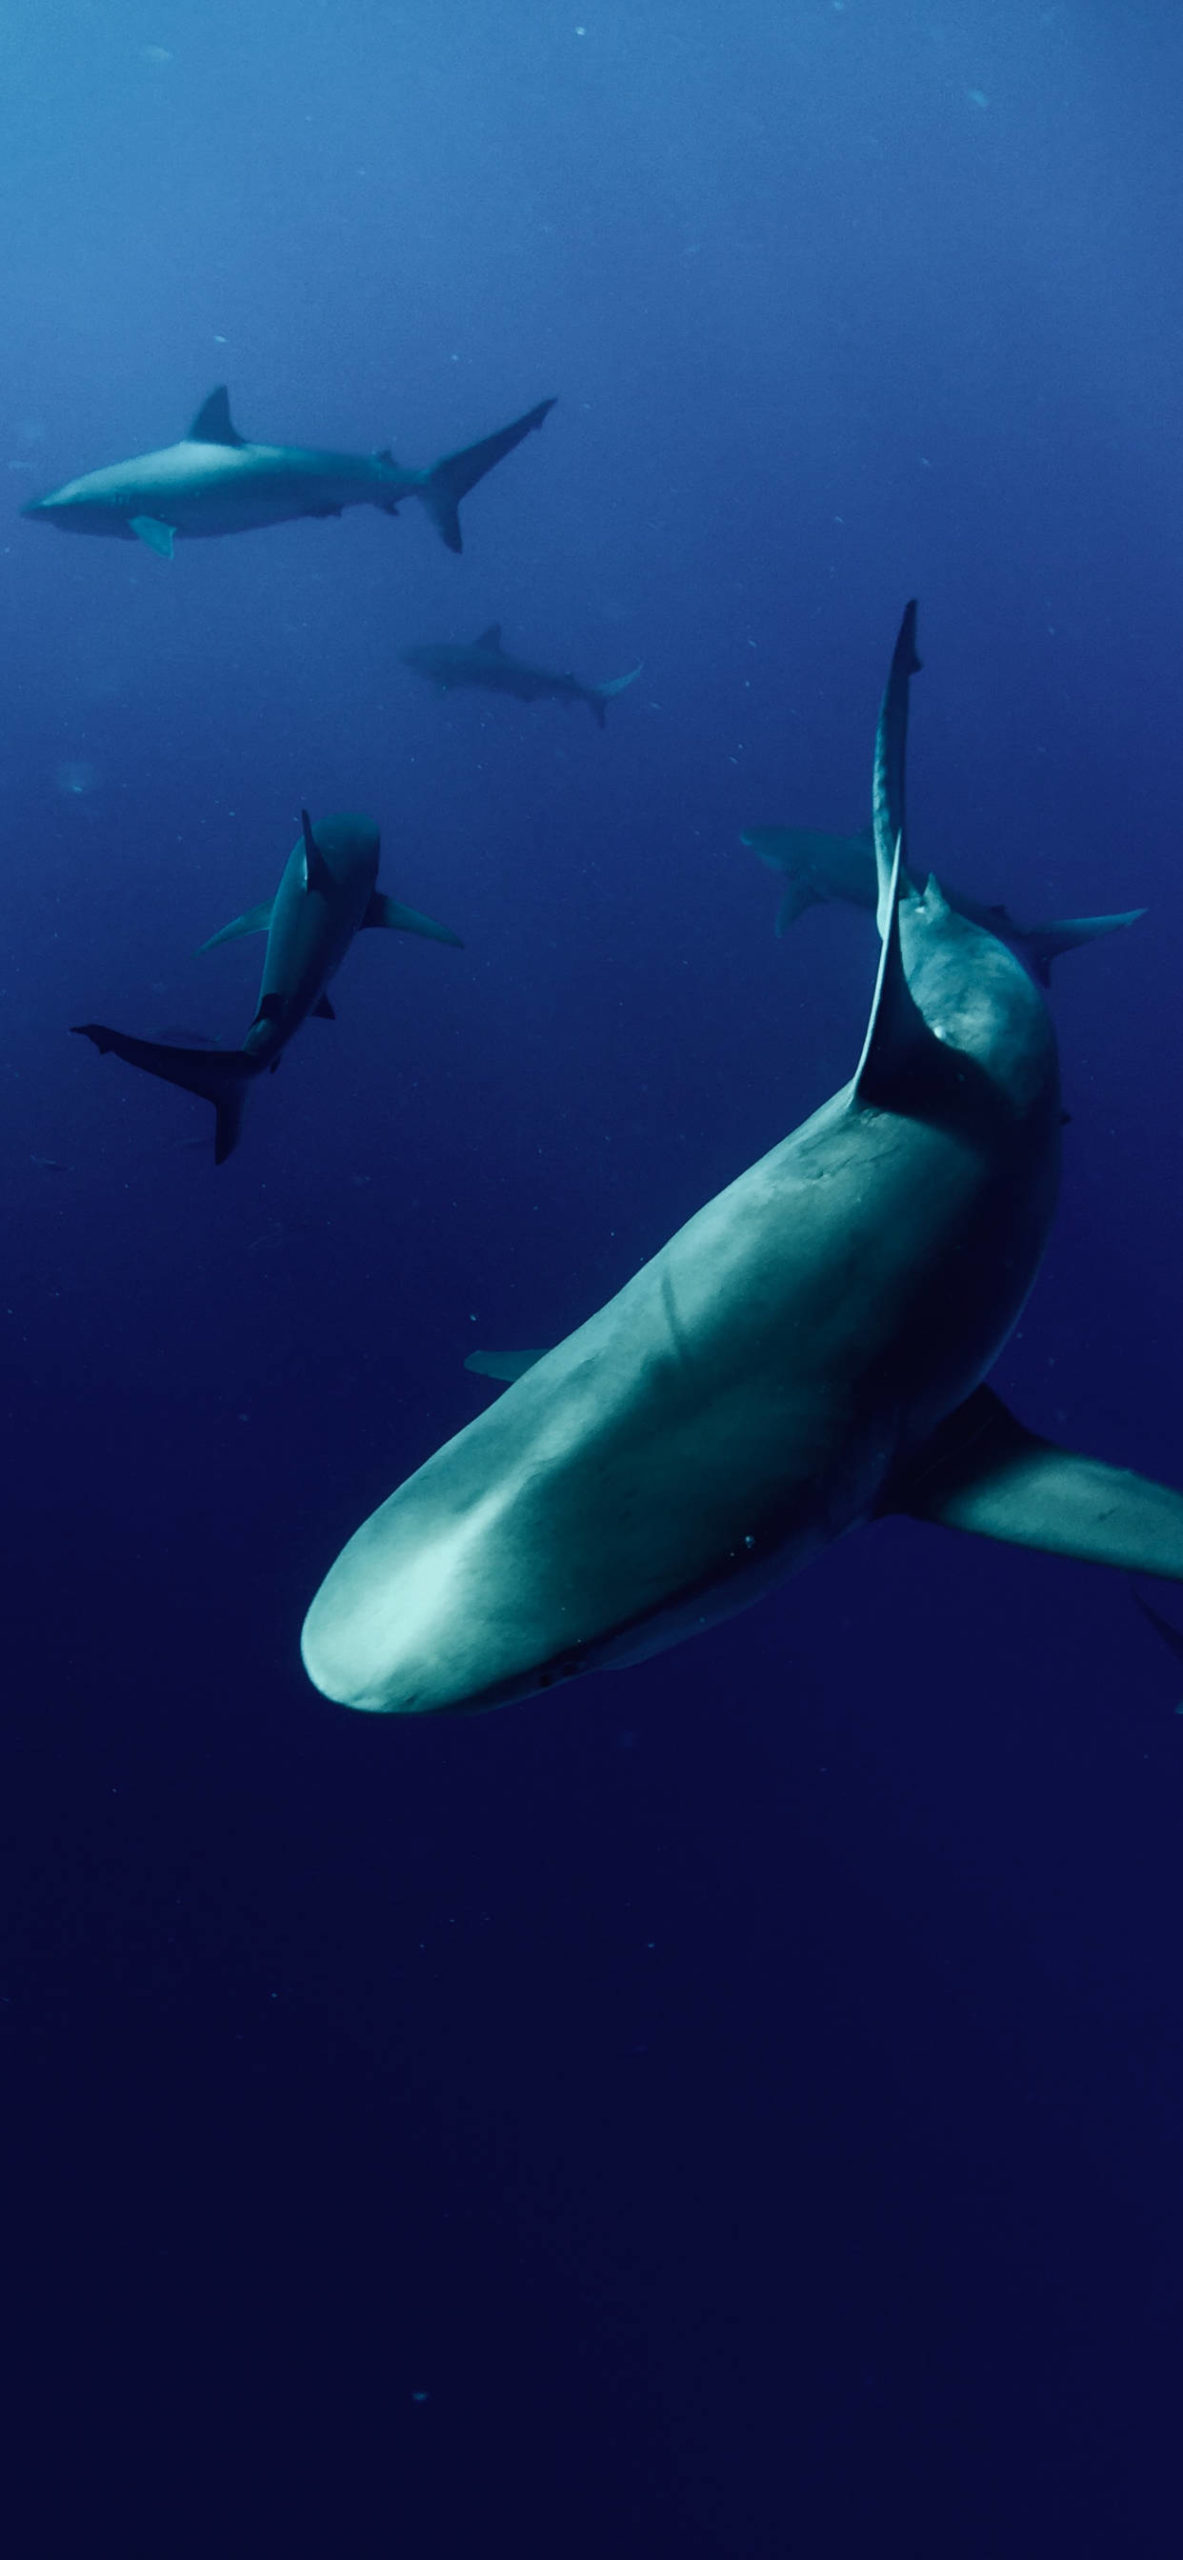 iPhone wallpapers shark haleiwa scaled Shark